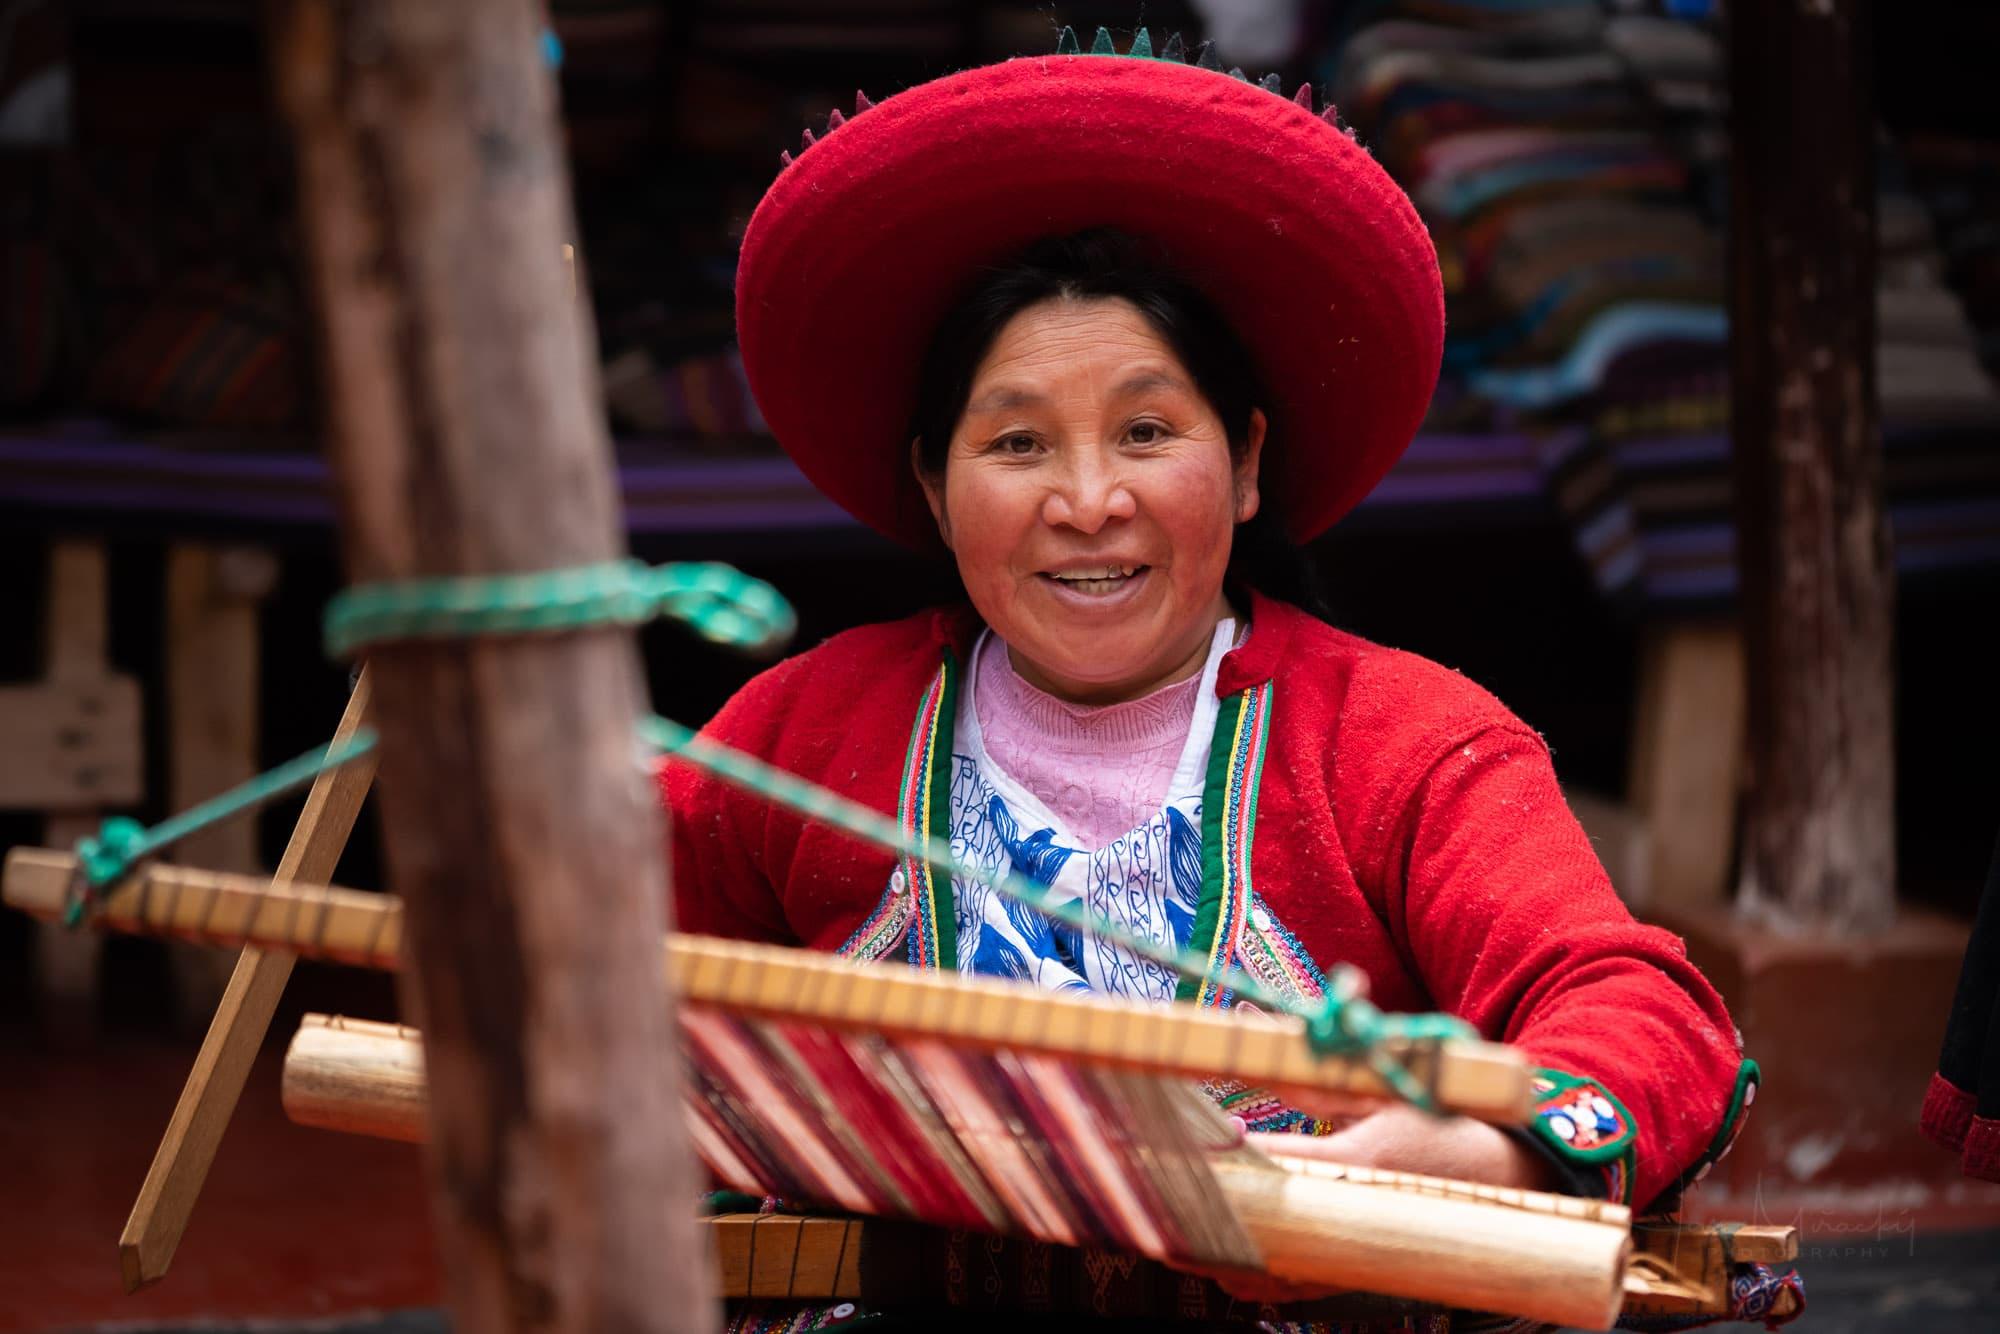 Peruvian woman at textile shop in Chinchero